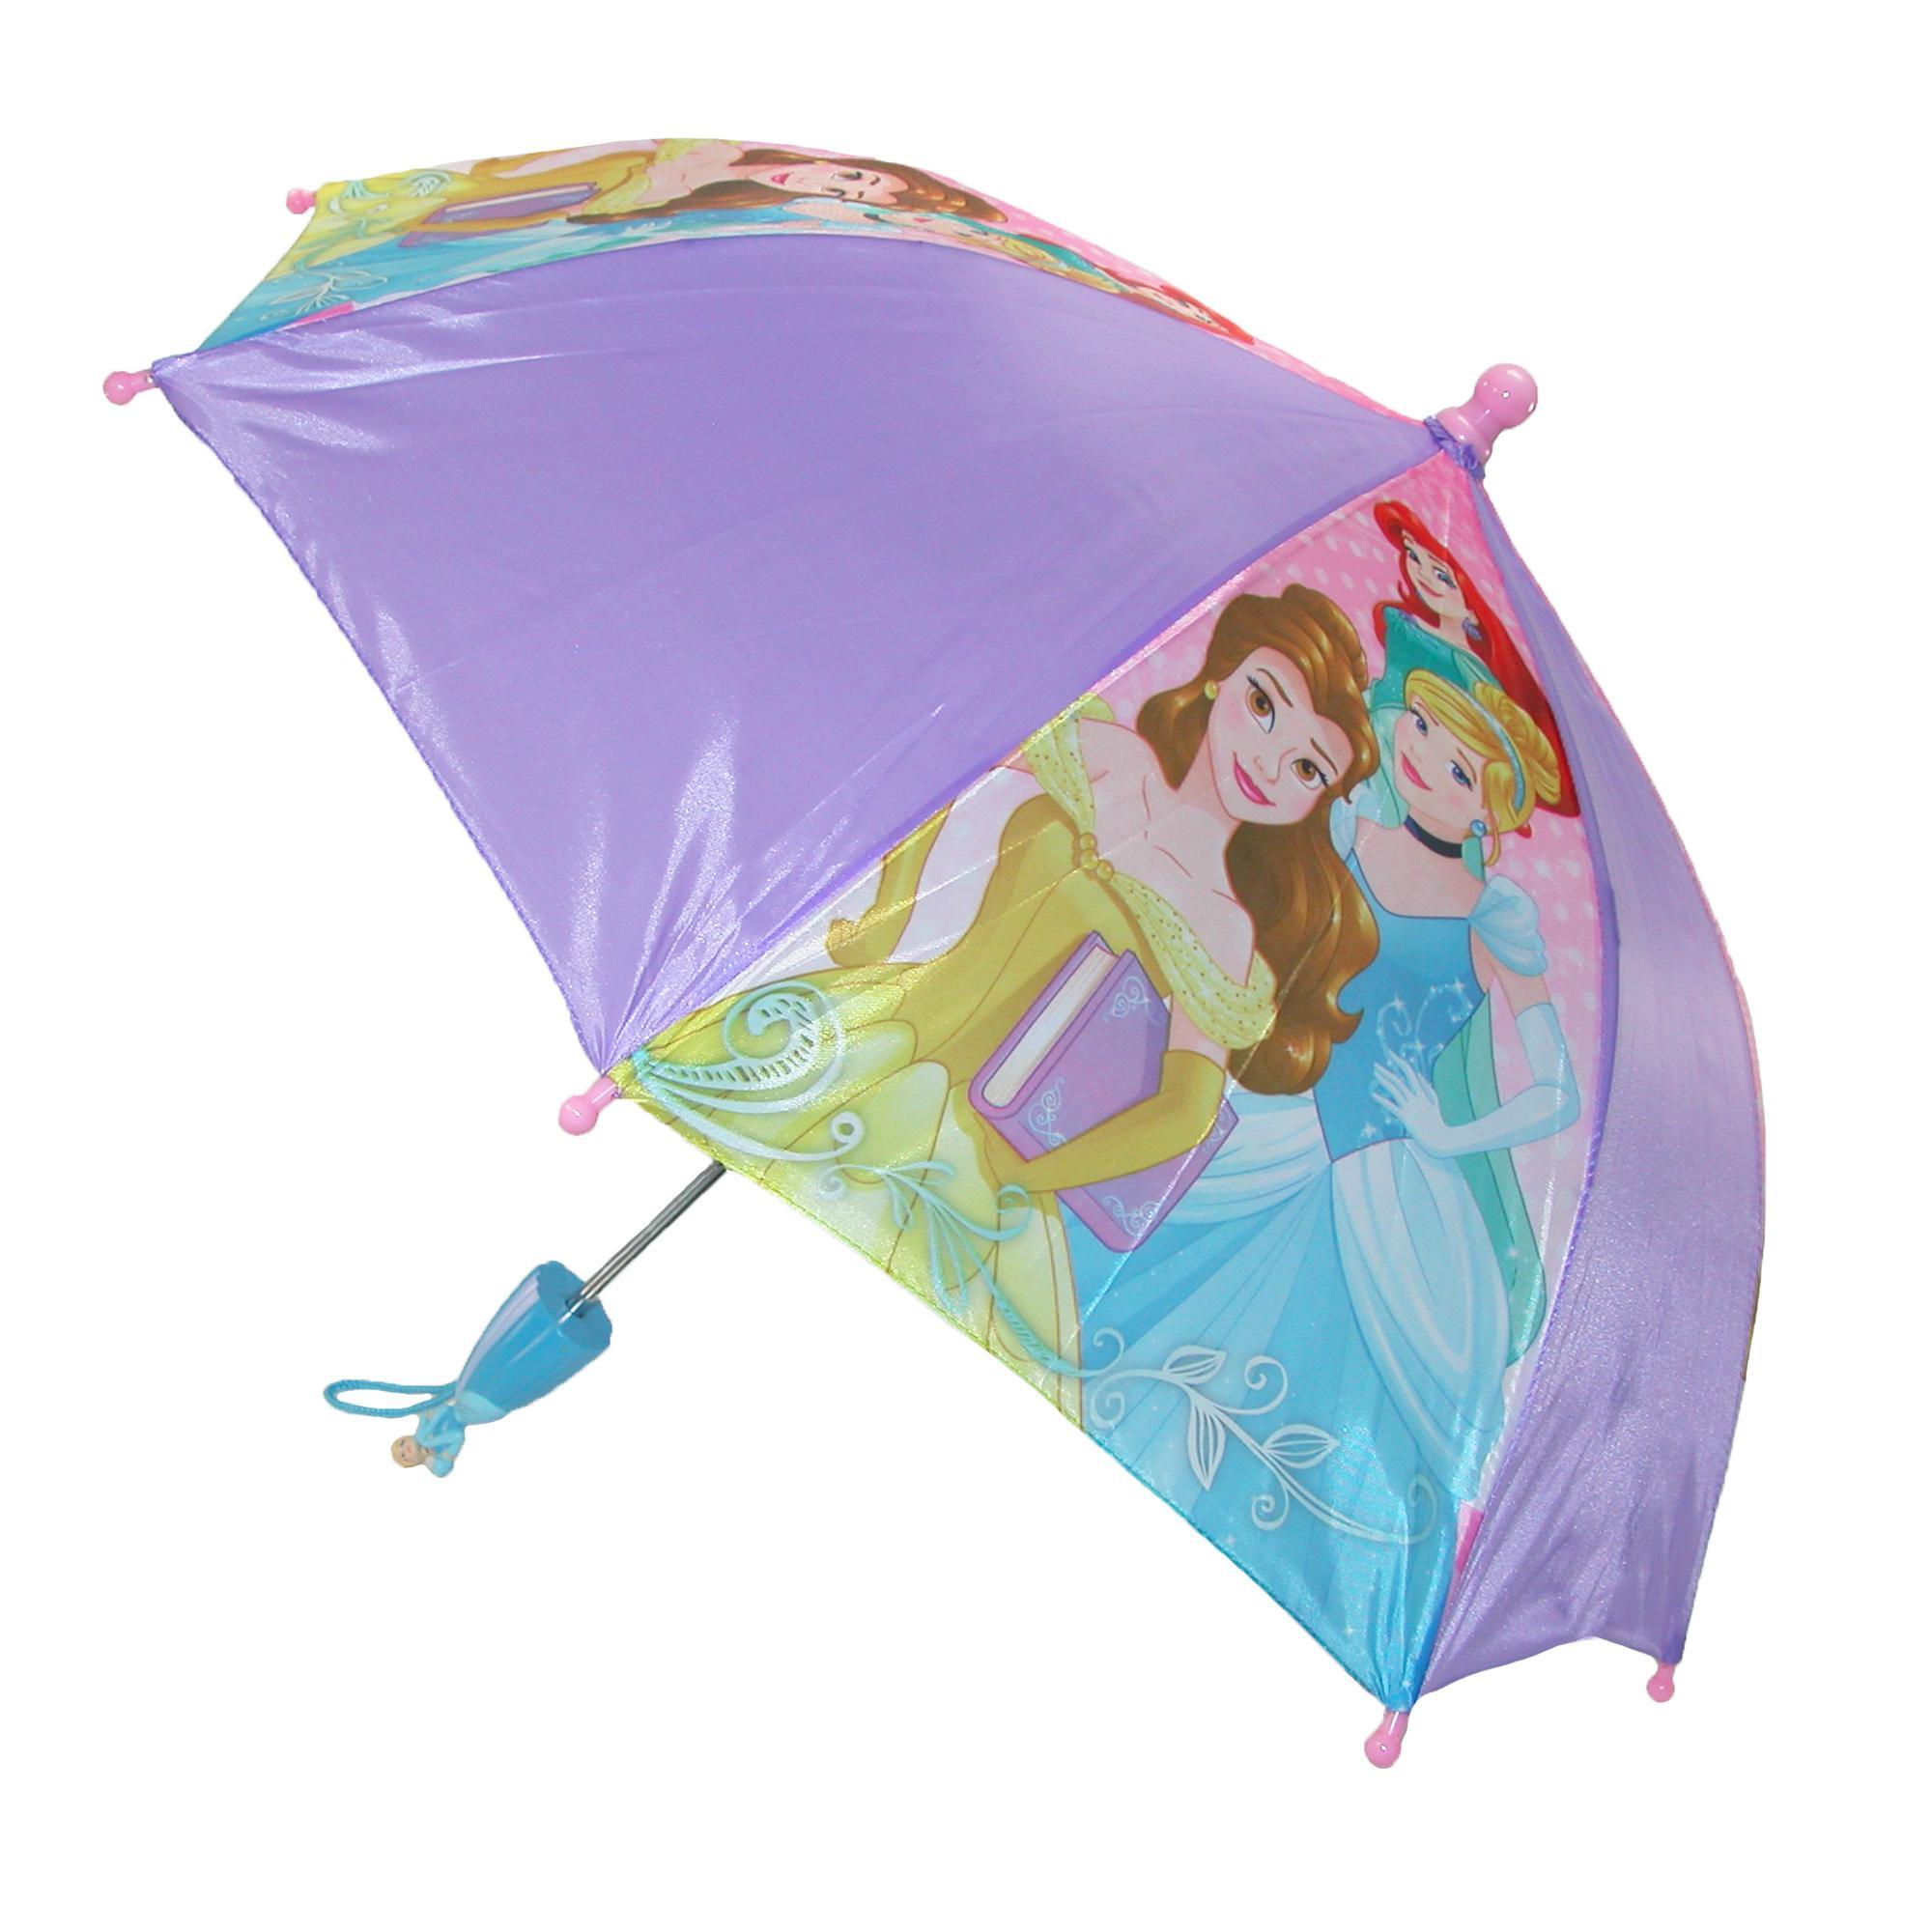 New Disney Kids Princess Stick Umbrella With Character Princess With Umbrella